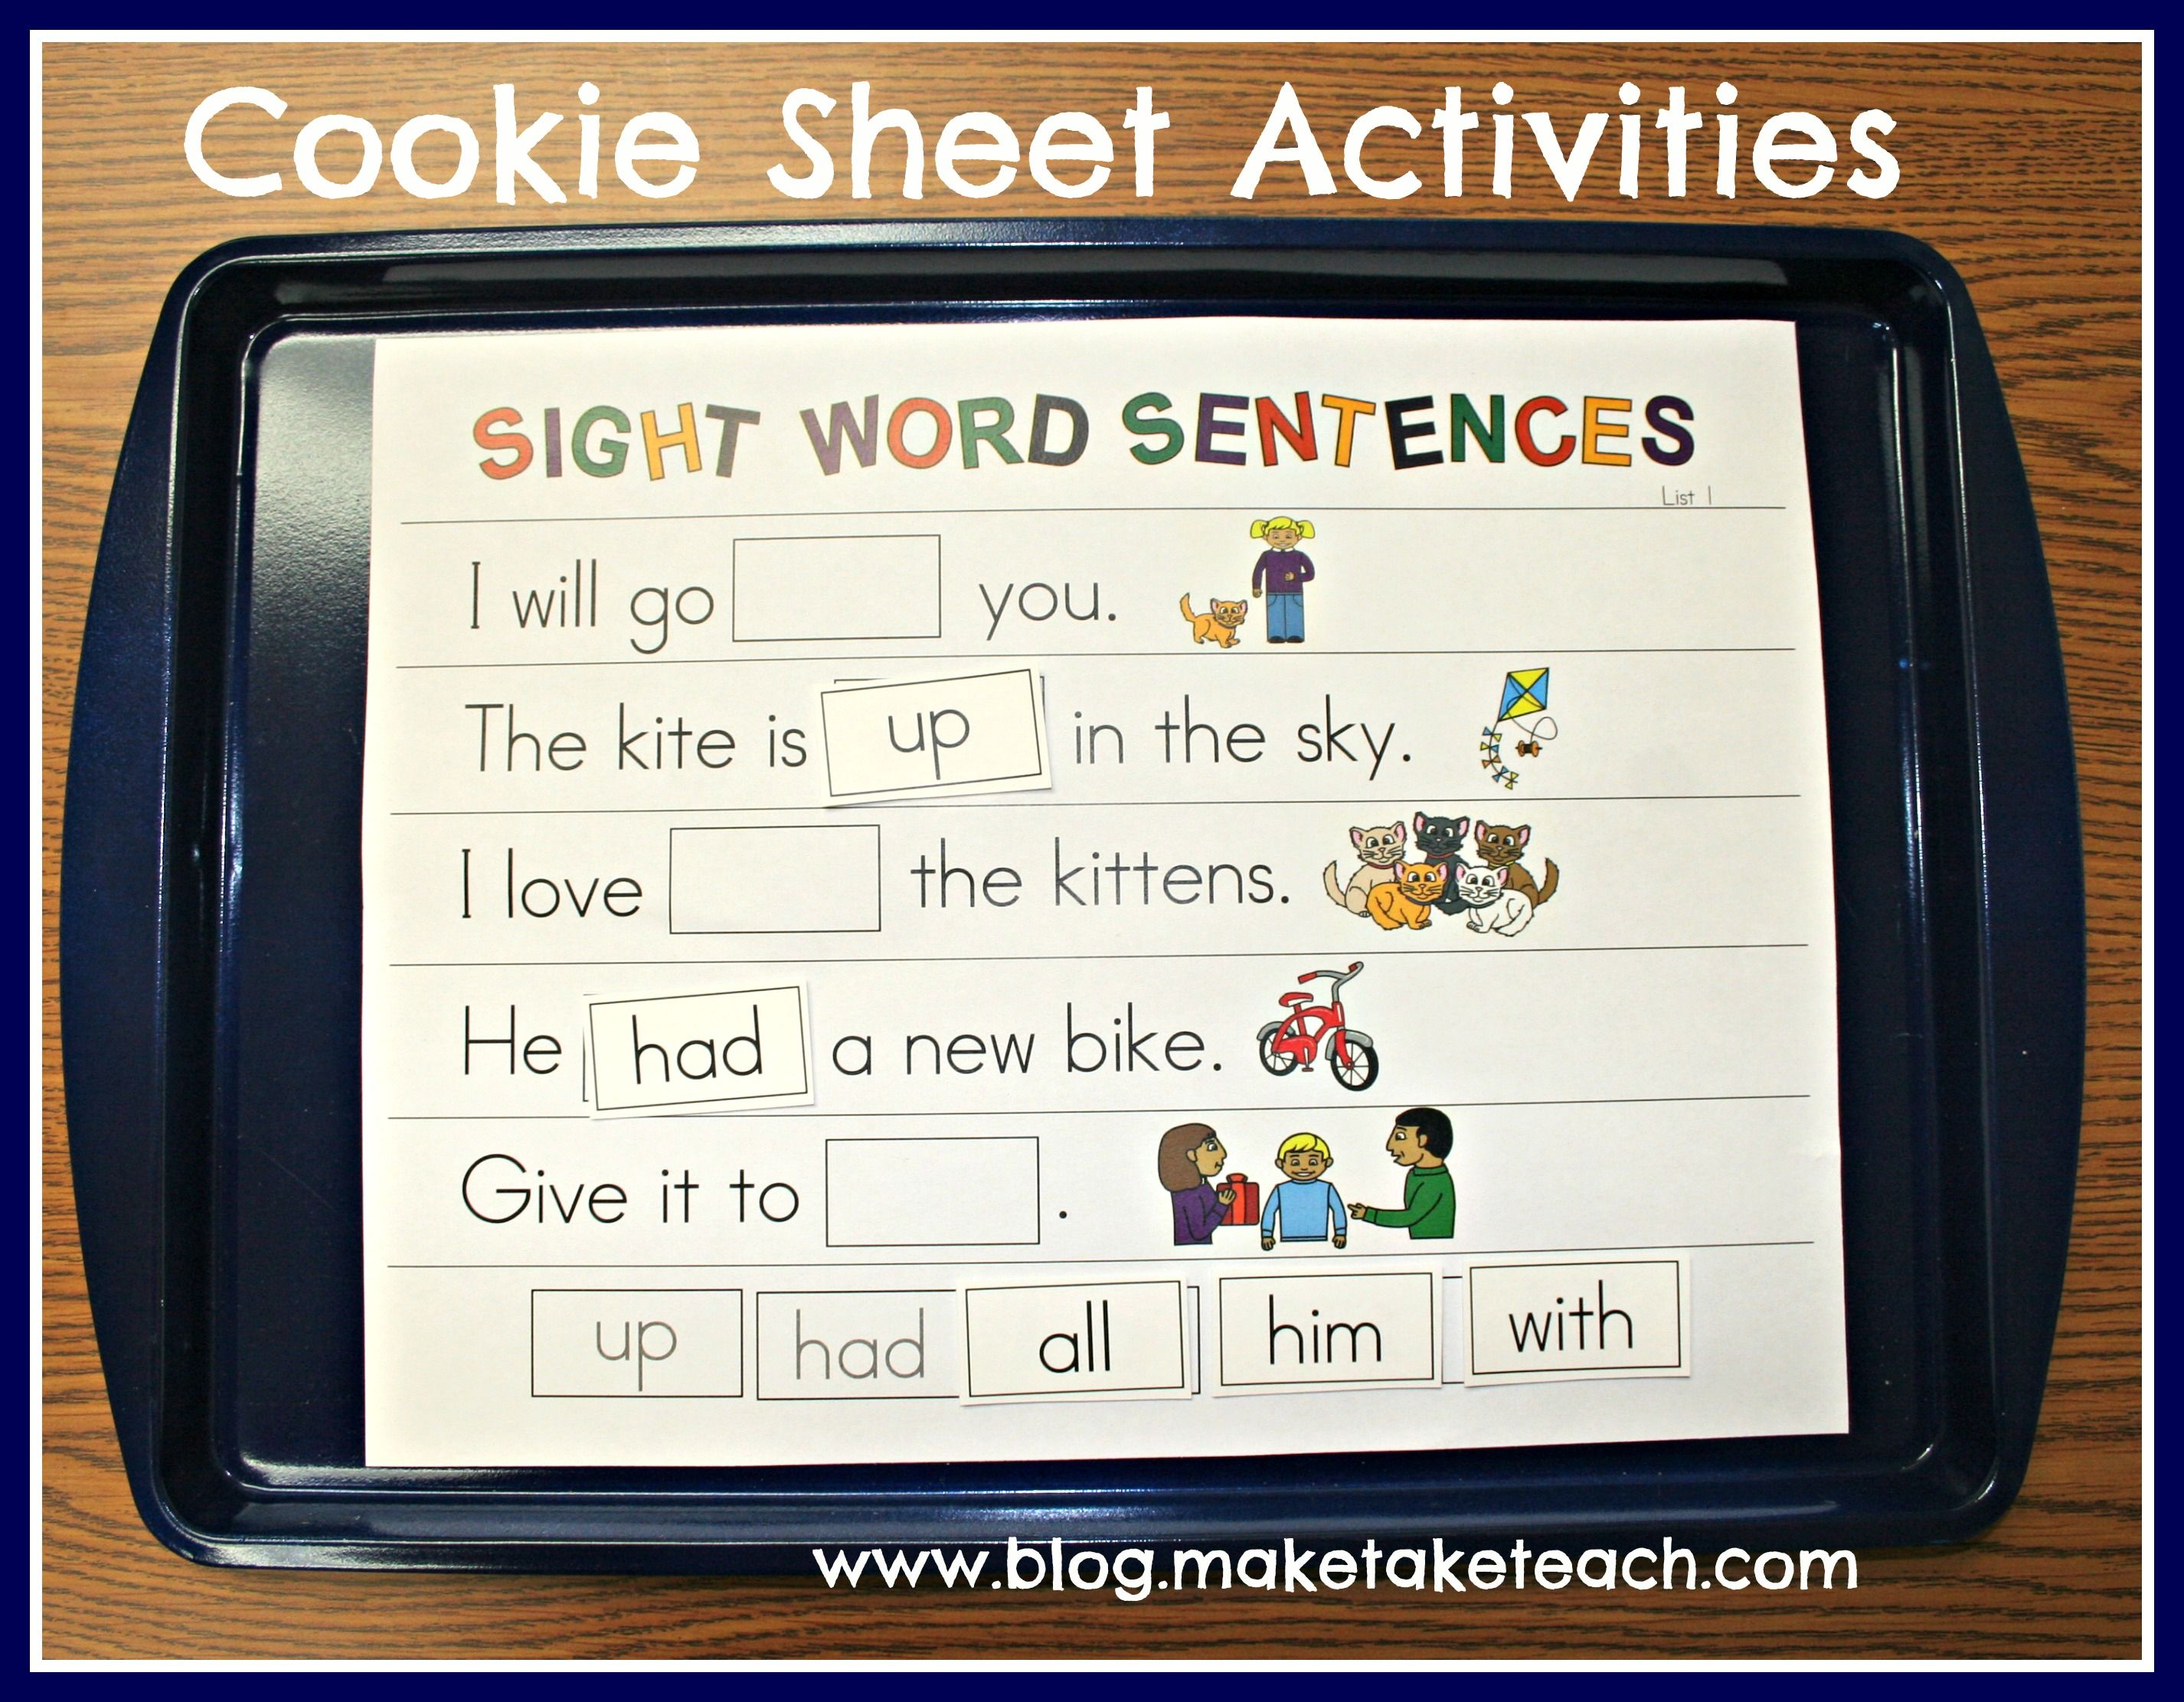 Cookie Sheet Challenge Volume 3 Sight Words